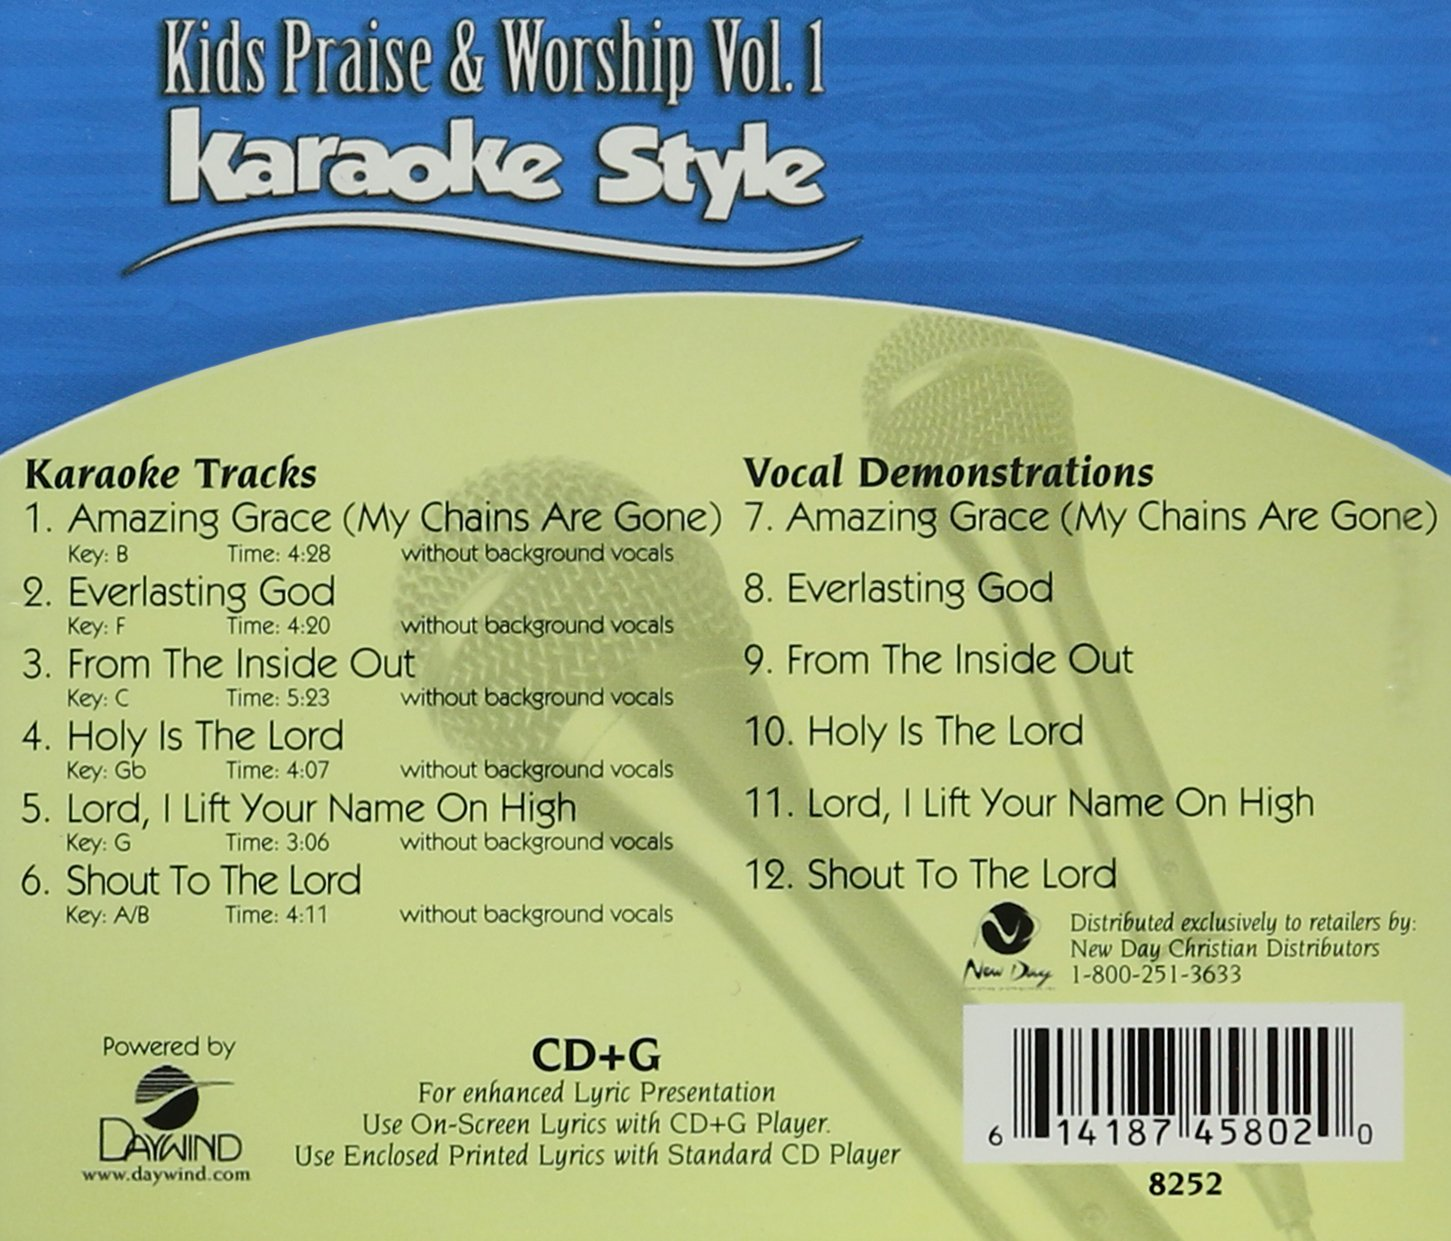 Karaoke Entertainment Well-Educated Country Love Songs Volume 3 Christian Karaoke Style New Cd+g Daywind 6 Songs